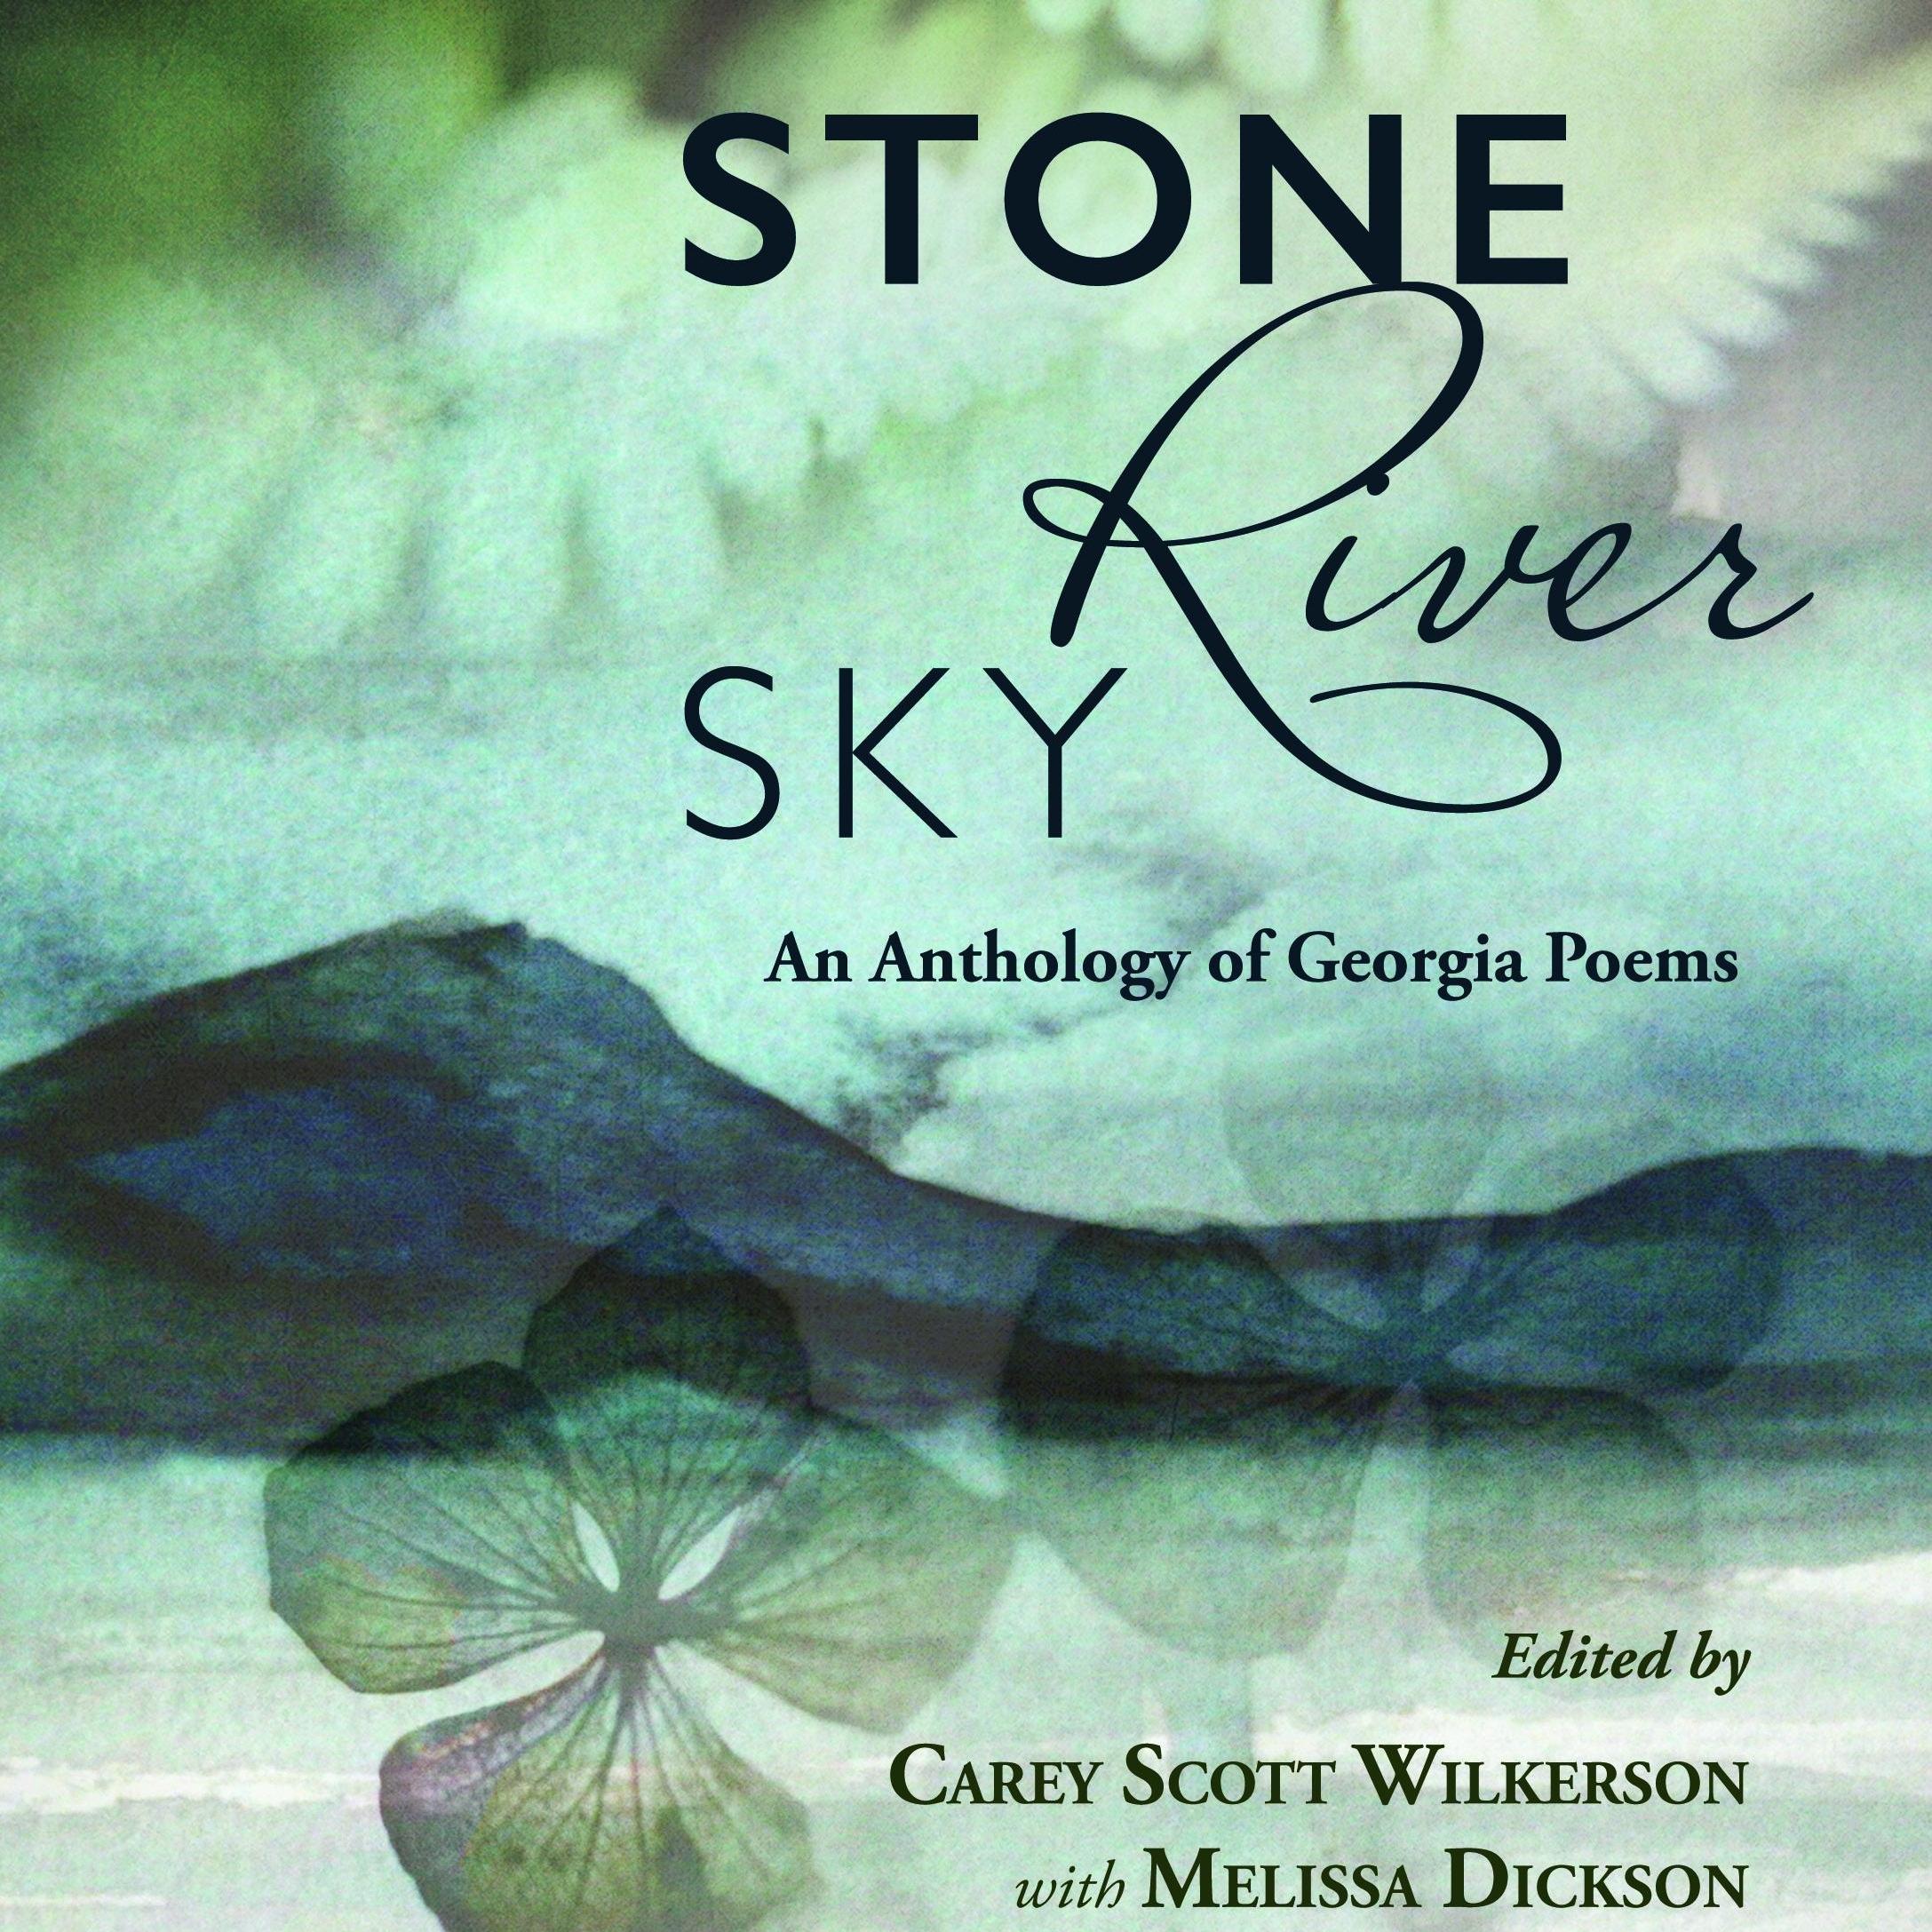 Stone River Sky.jpg